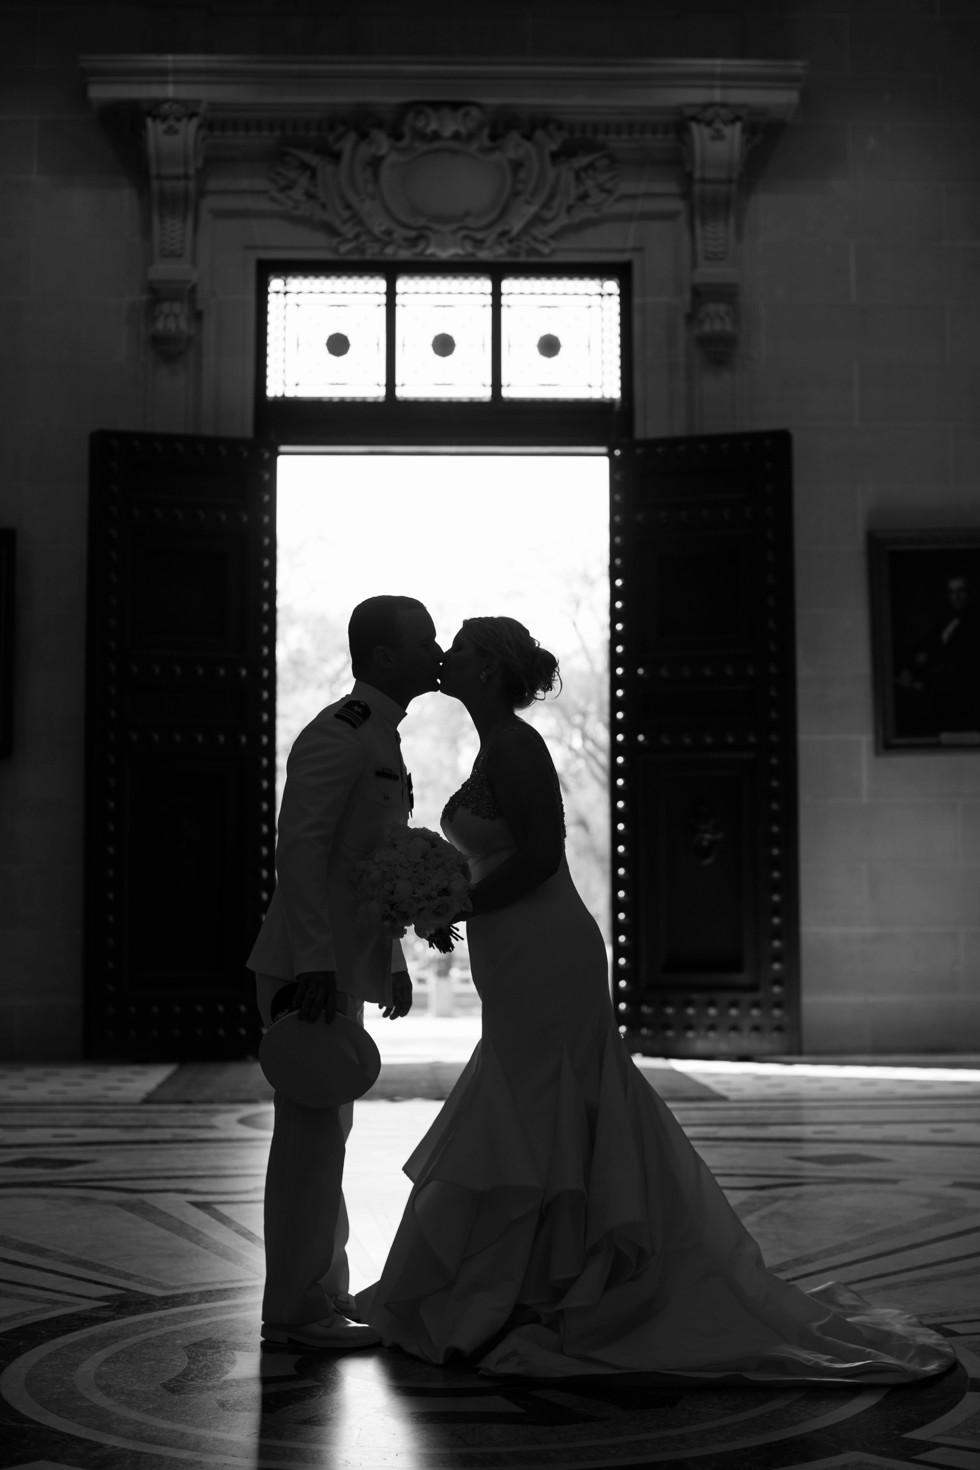 USNA Bancroft Hall silhouette wedding portrait